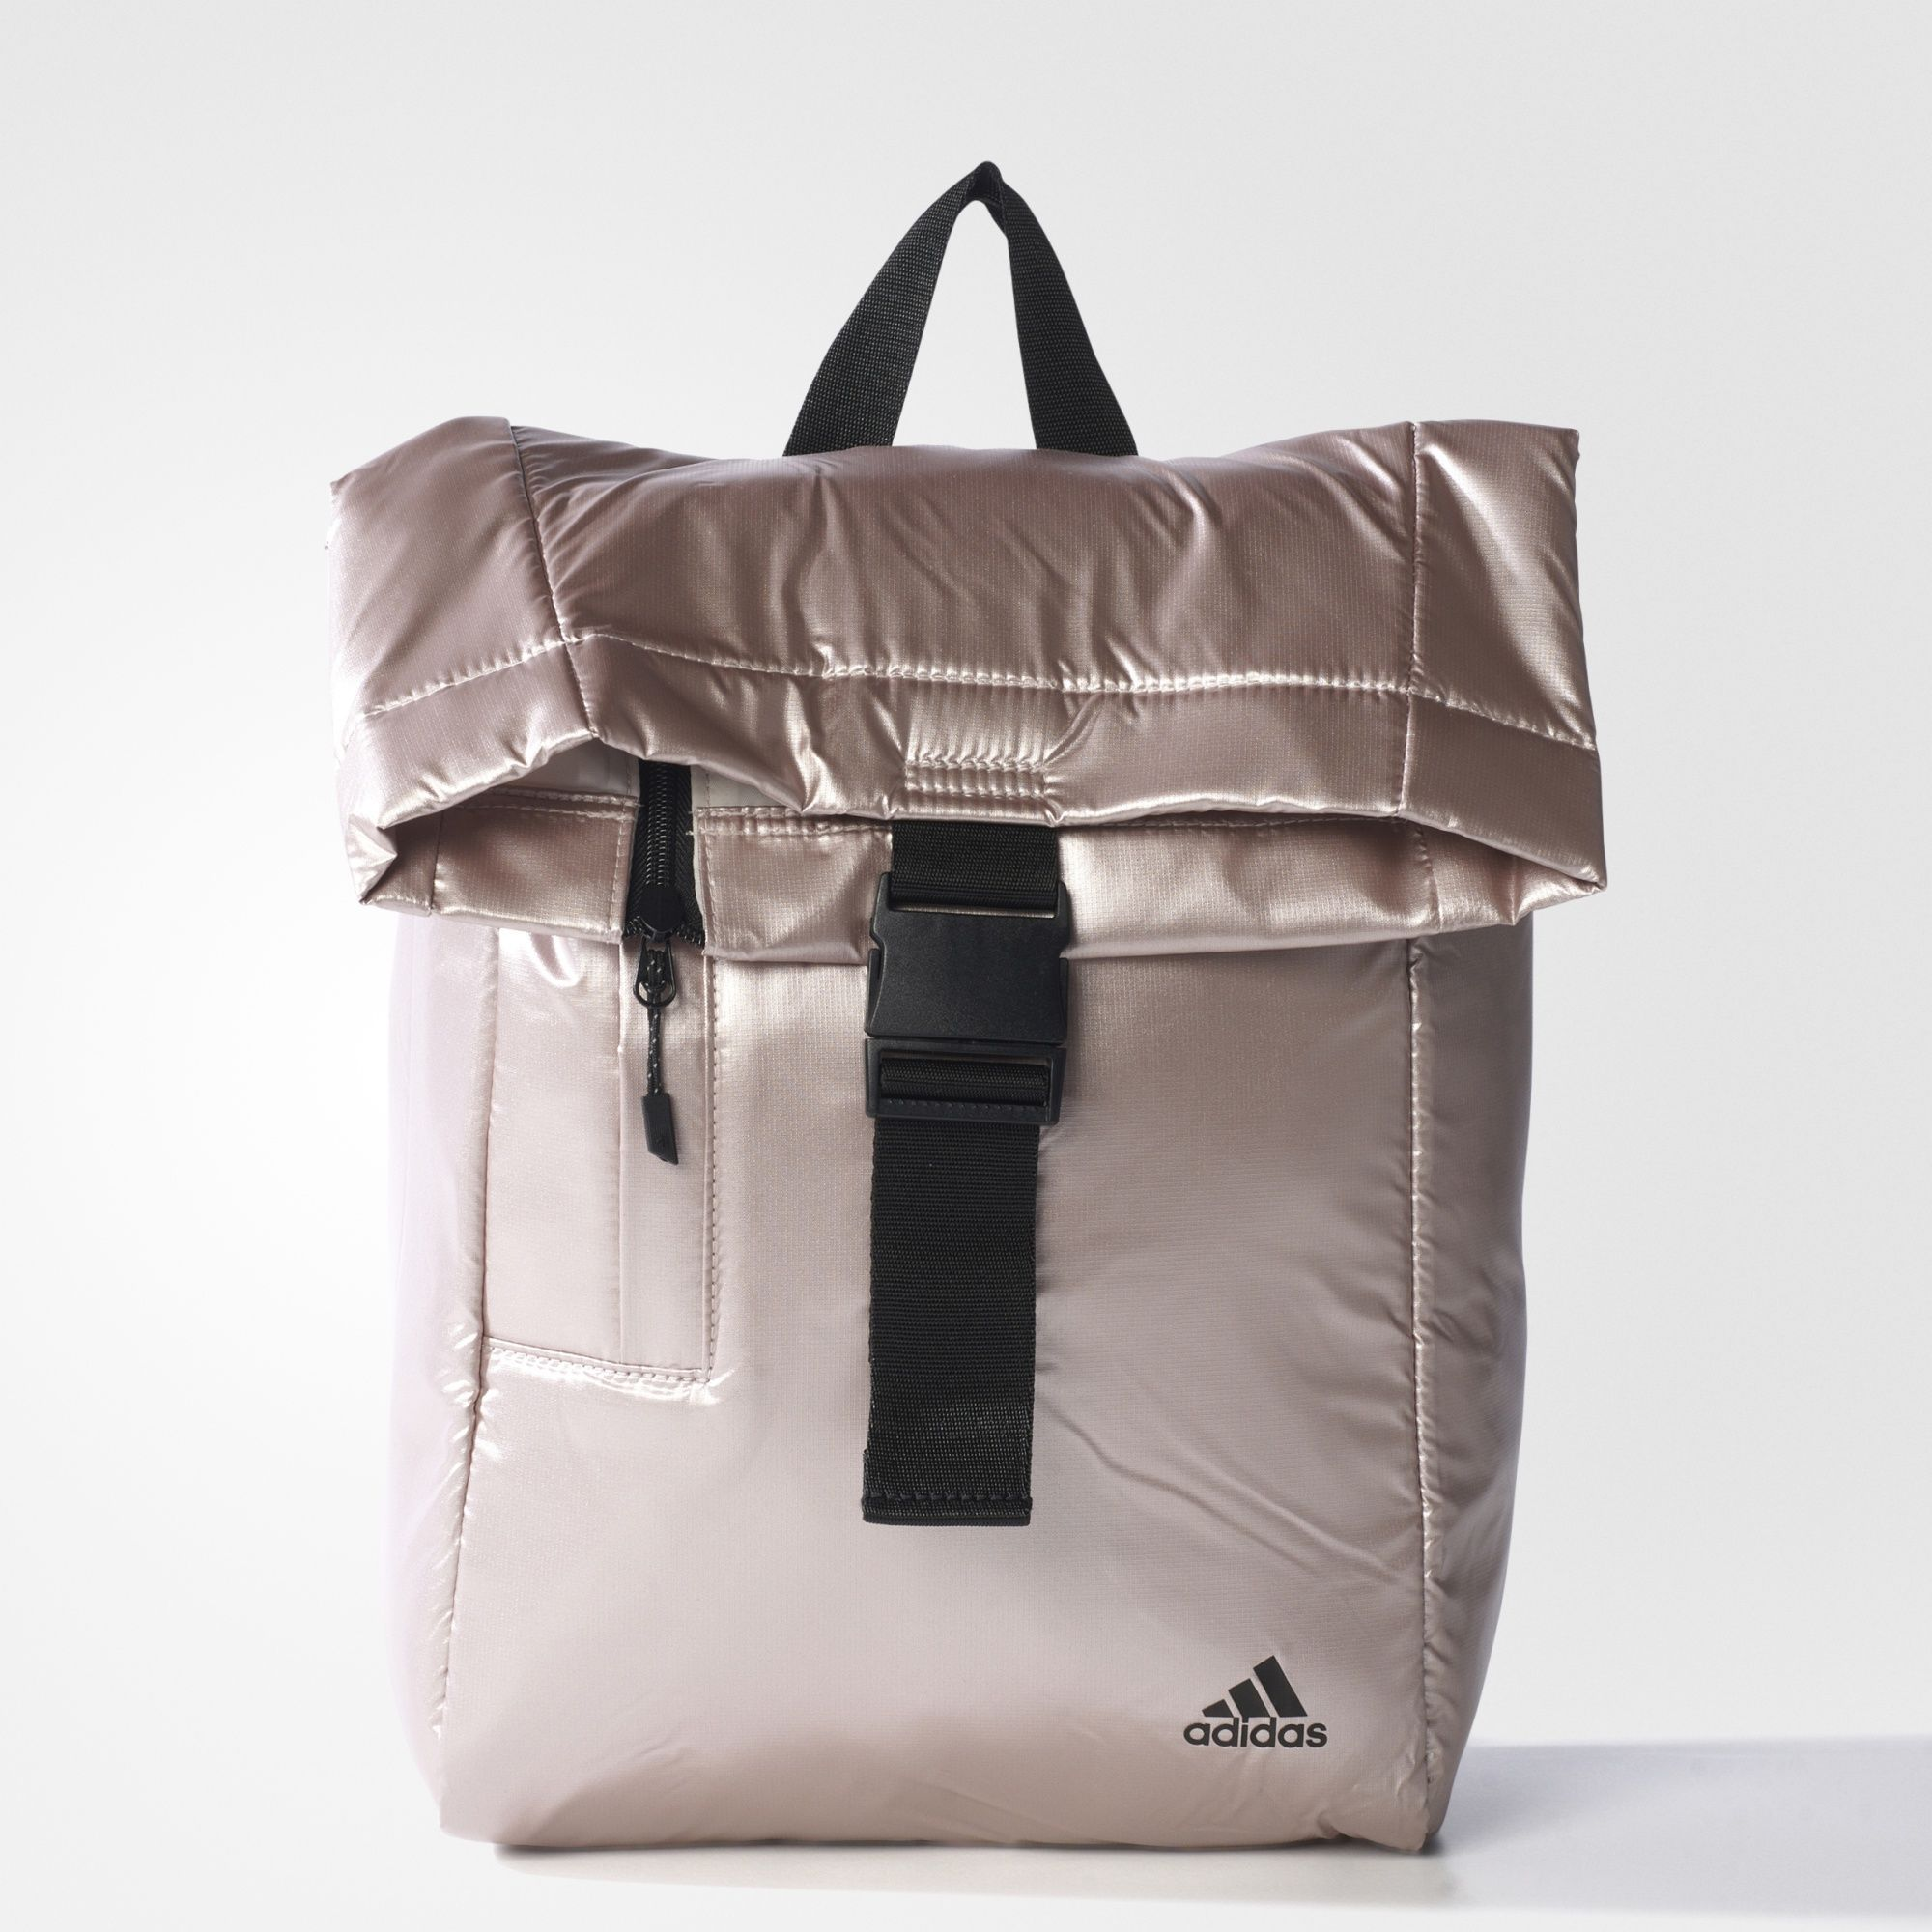 adidas - Gym Backpack Gym Backpack, Gym Bag, Adidas Bags, Shoulder Strap, 9dc4aeb8a1